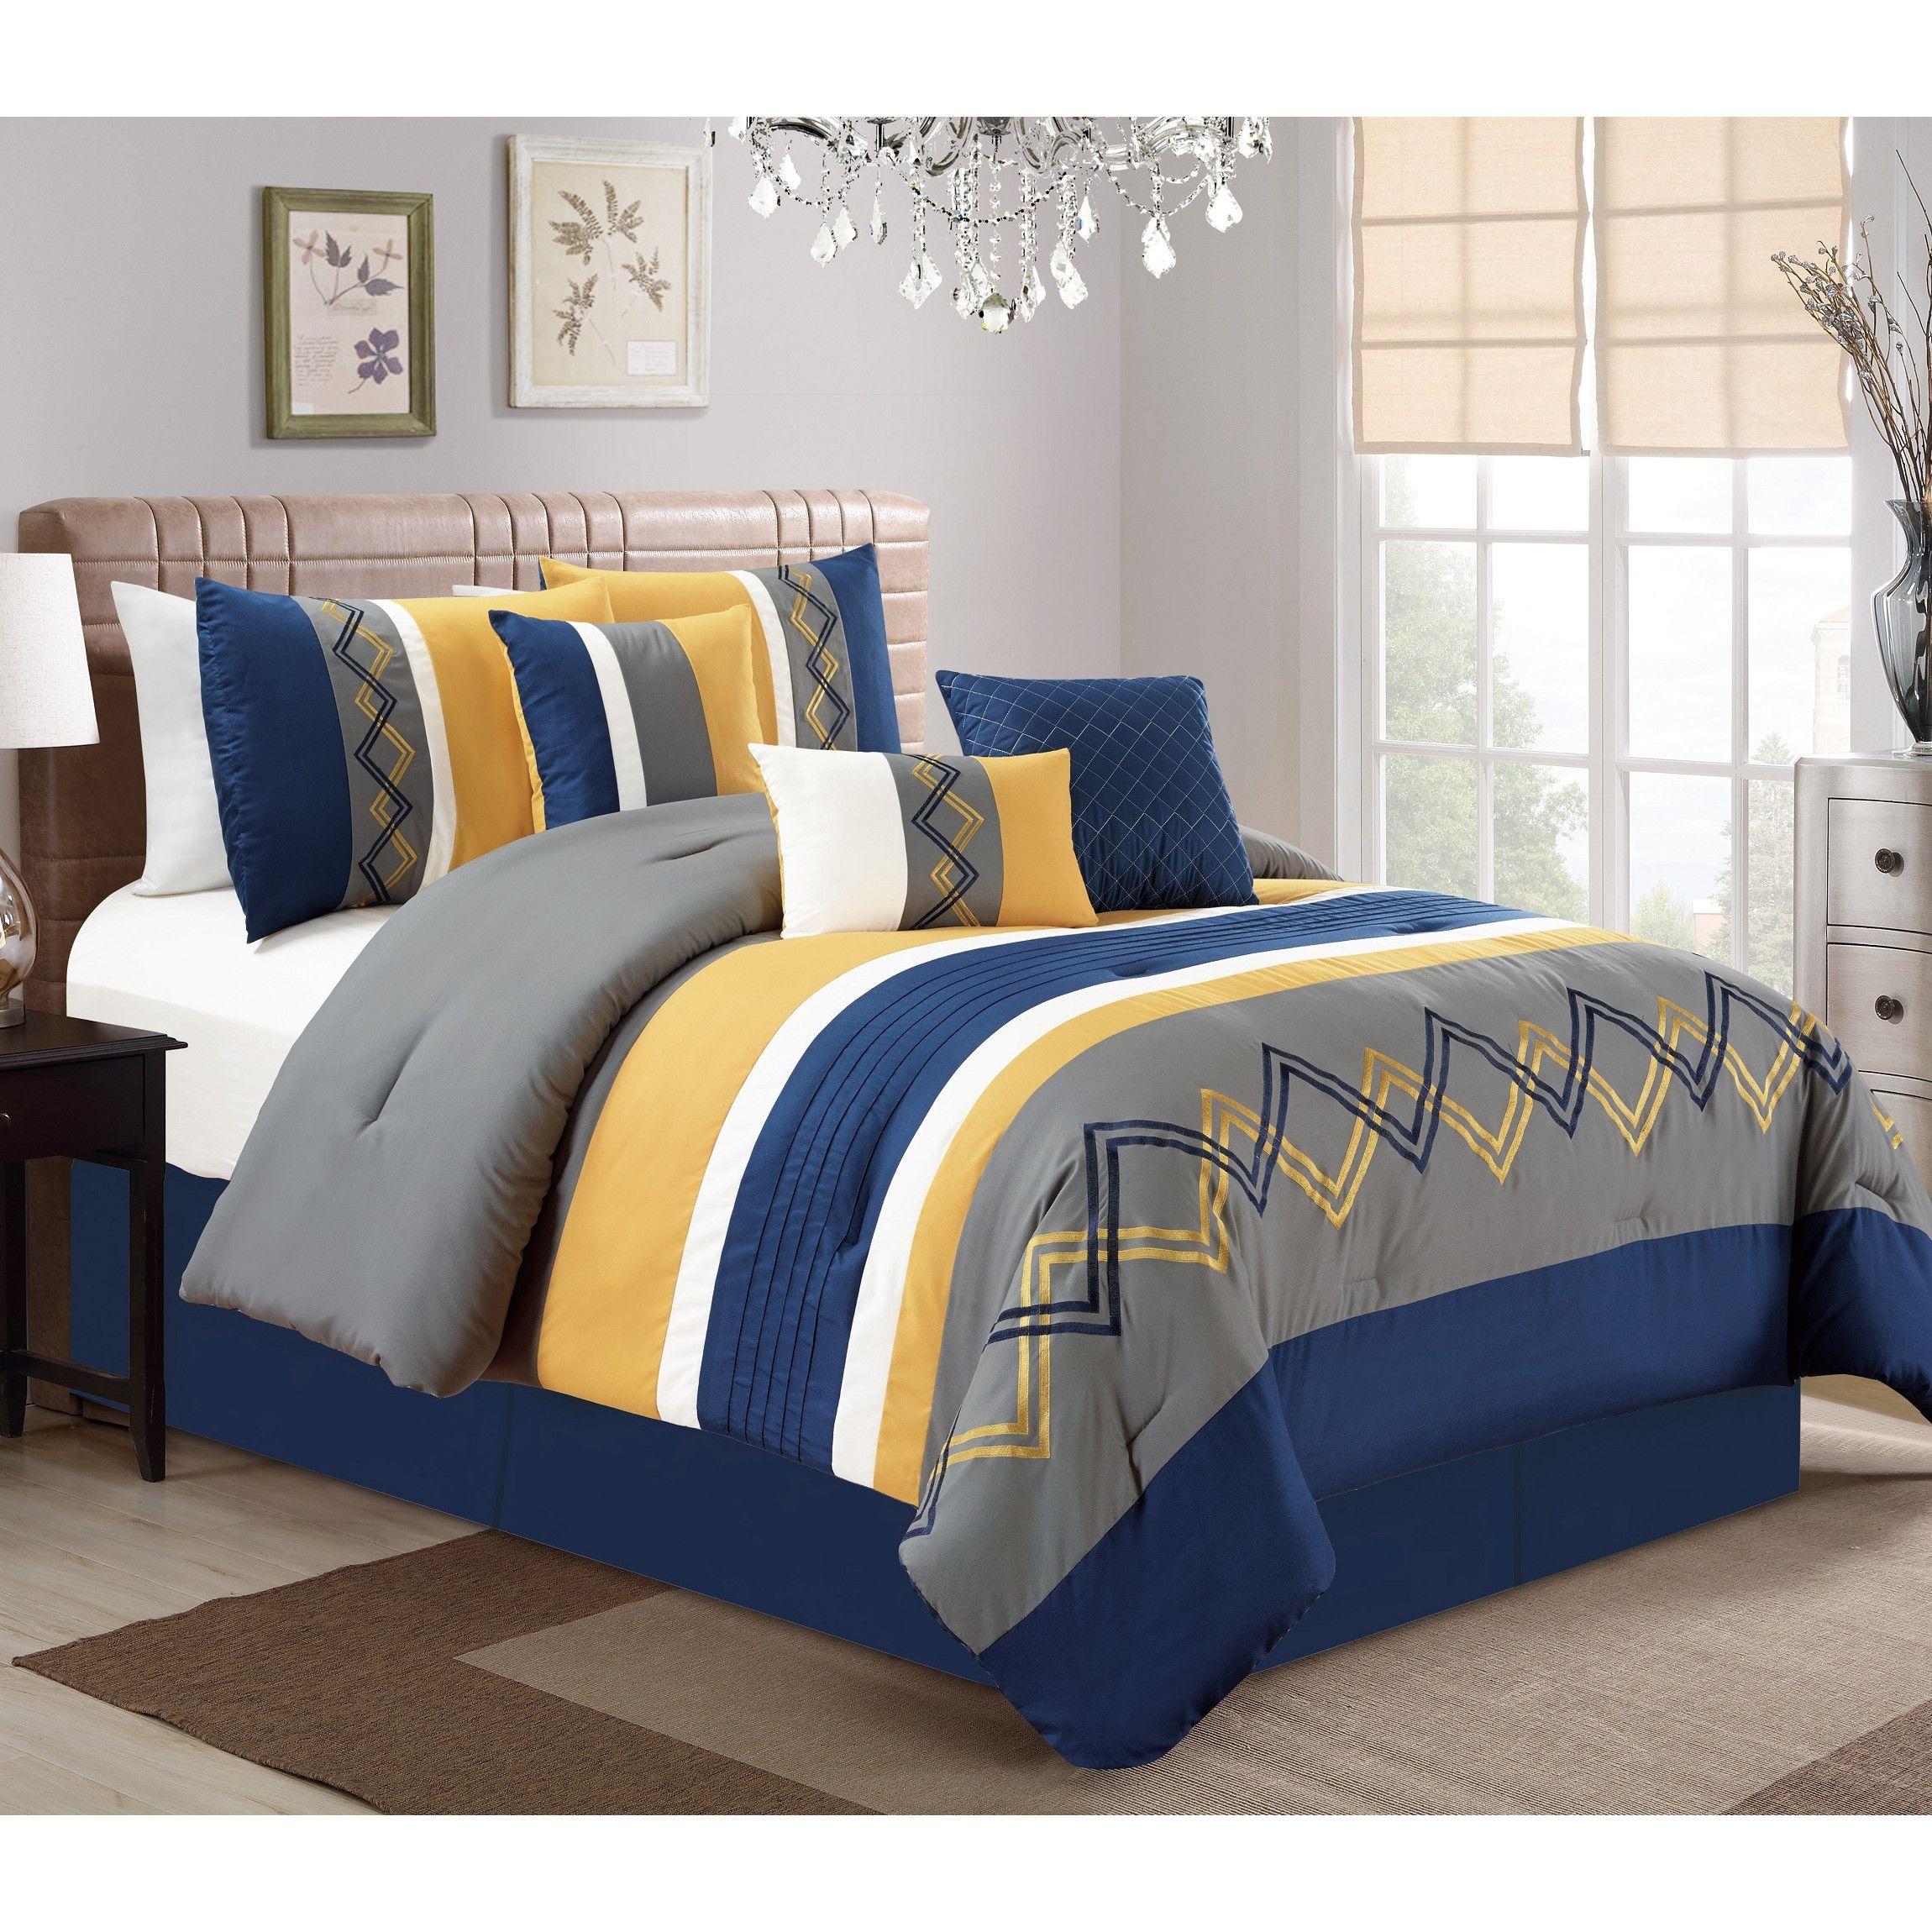 Home Corey 7 Piece Comforter Set Comforter sets